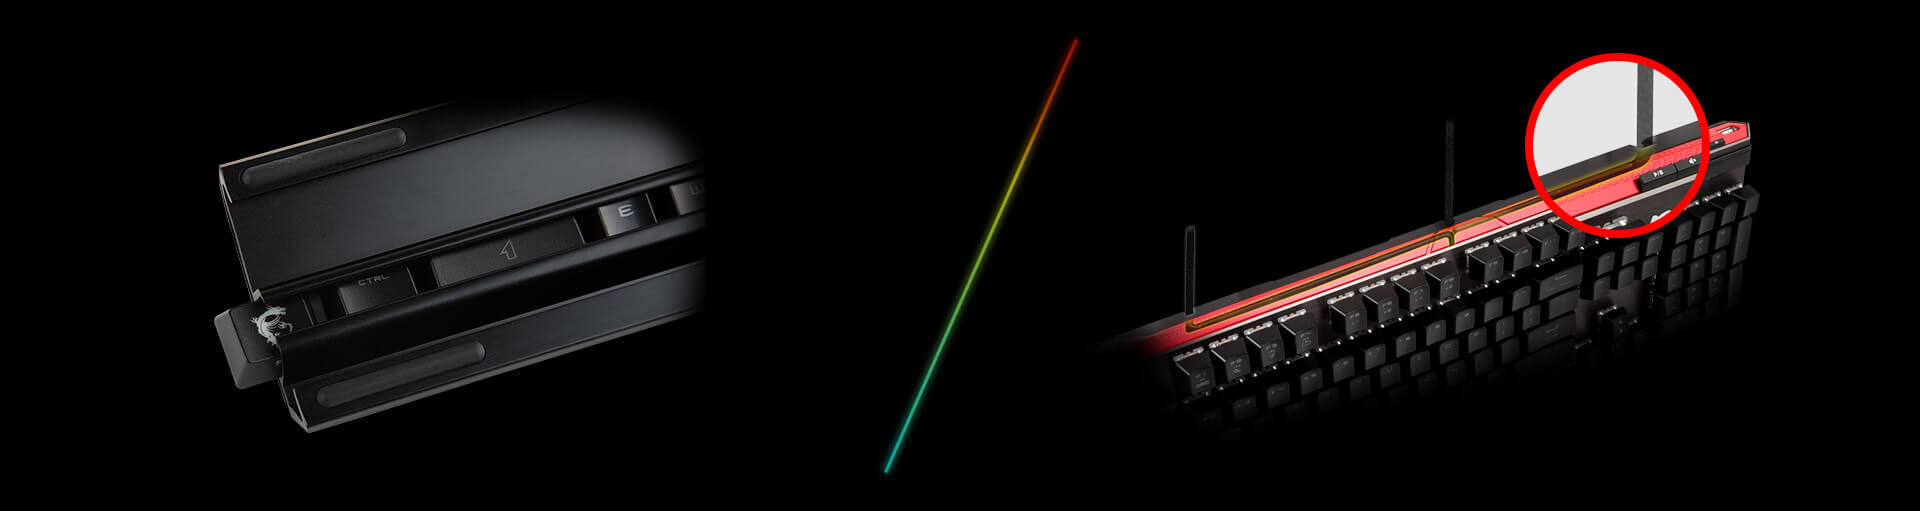 RGB Mystic Light